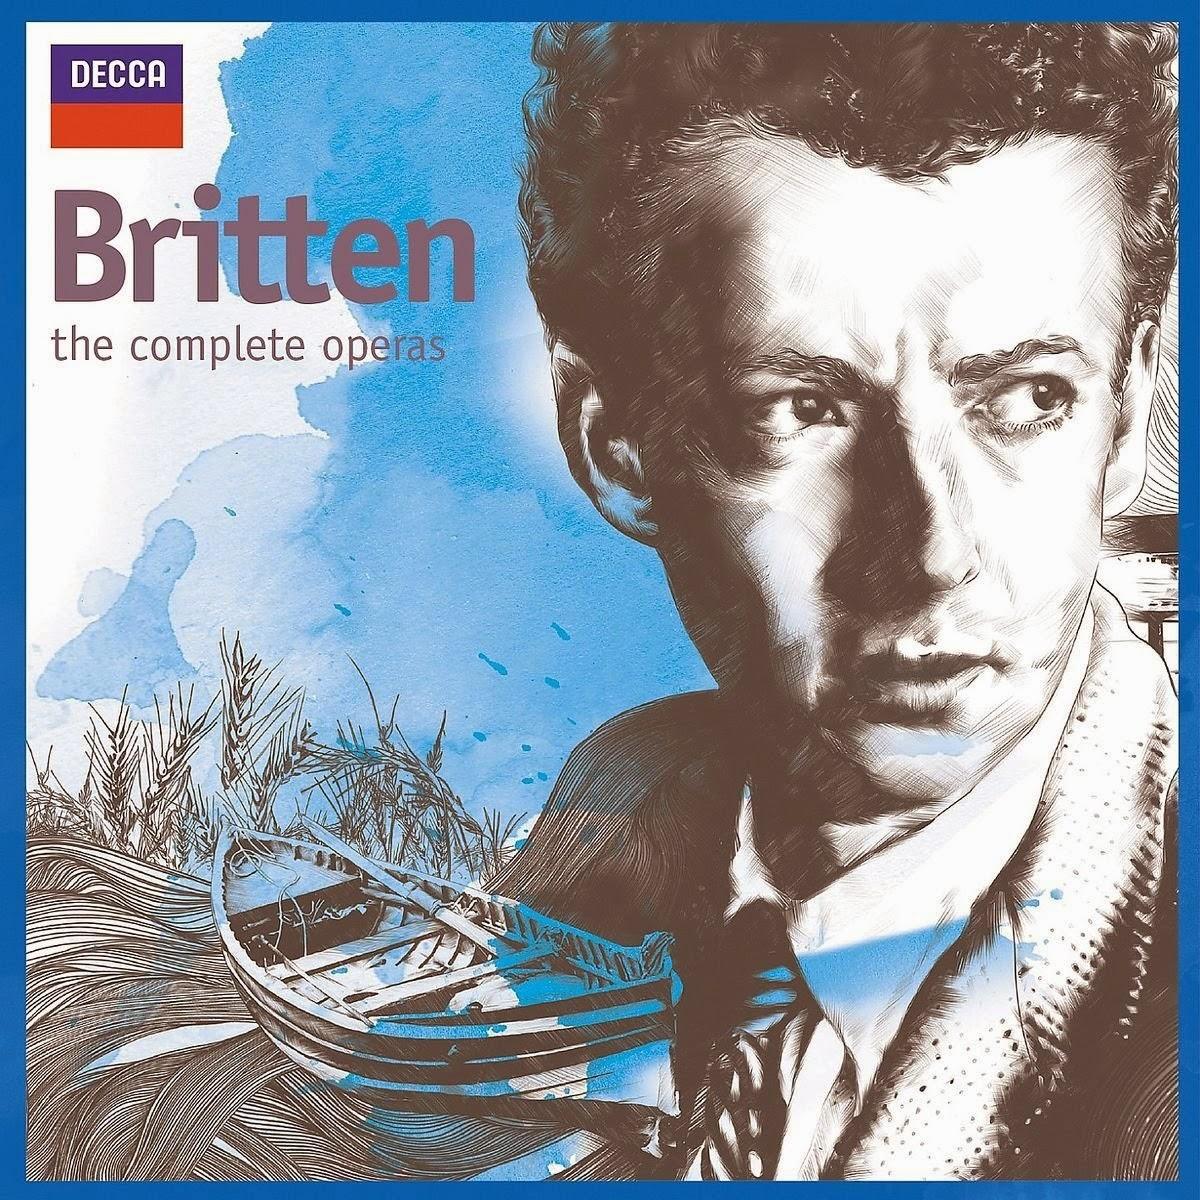 http://ad.zanox.com/ppc/?22264400C1400712249&ulp=[[musique.fnac.com%2Fa6586670%2FBenjamin-Britten-Complete-operas-Coffret-20-CD-CD-album]]